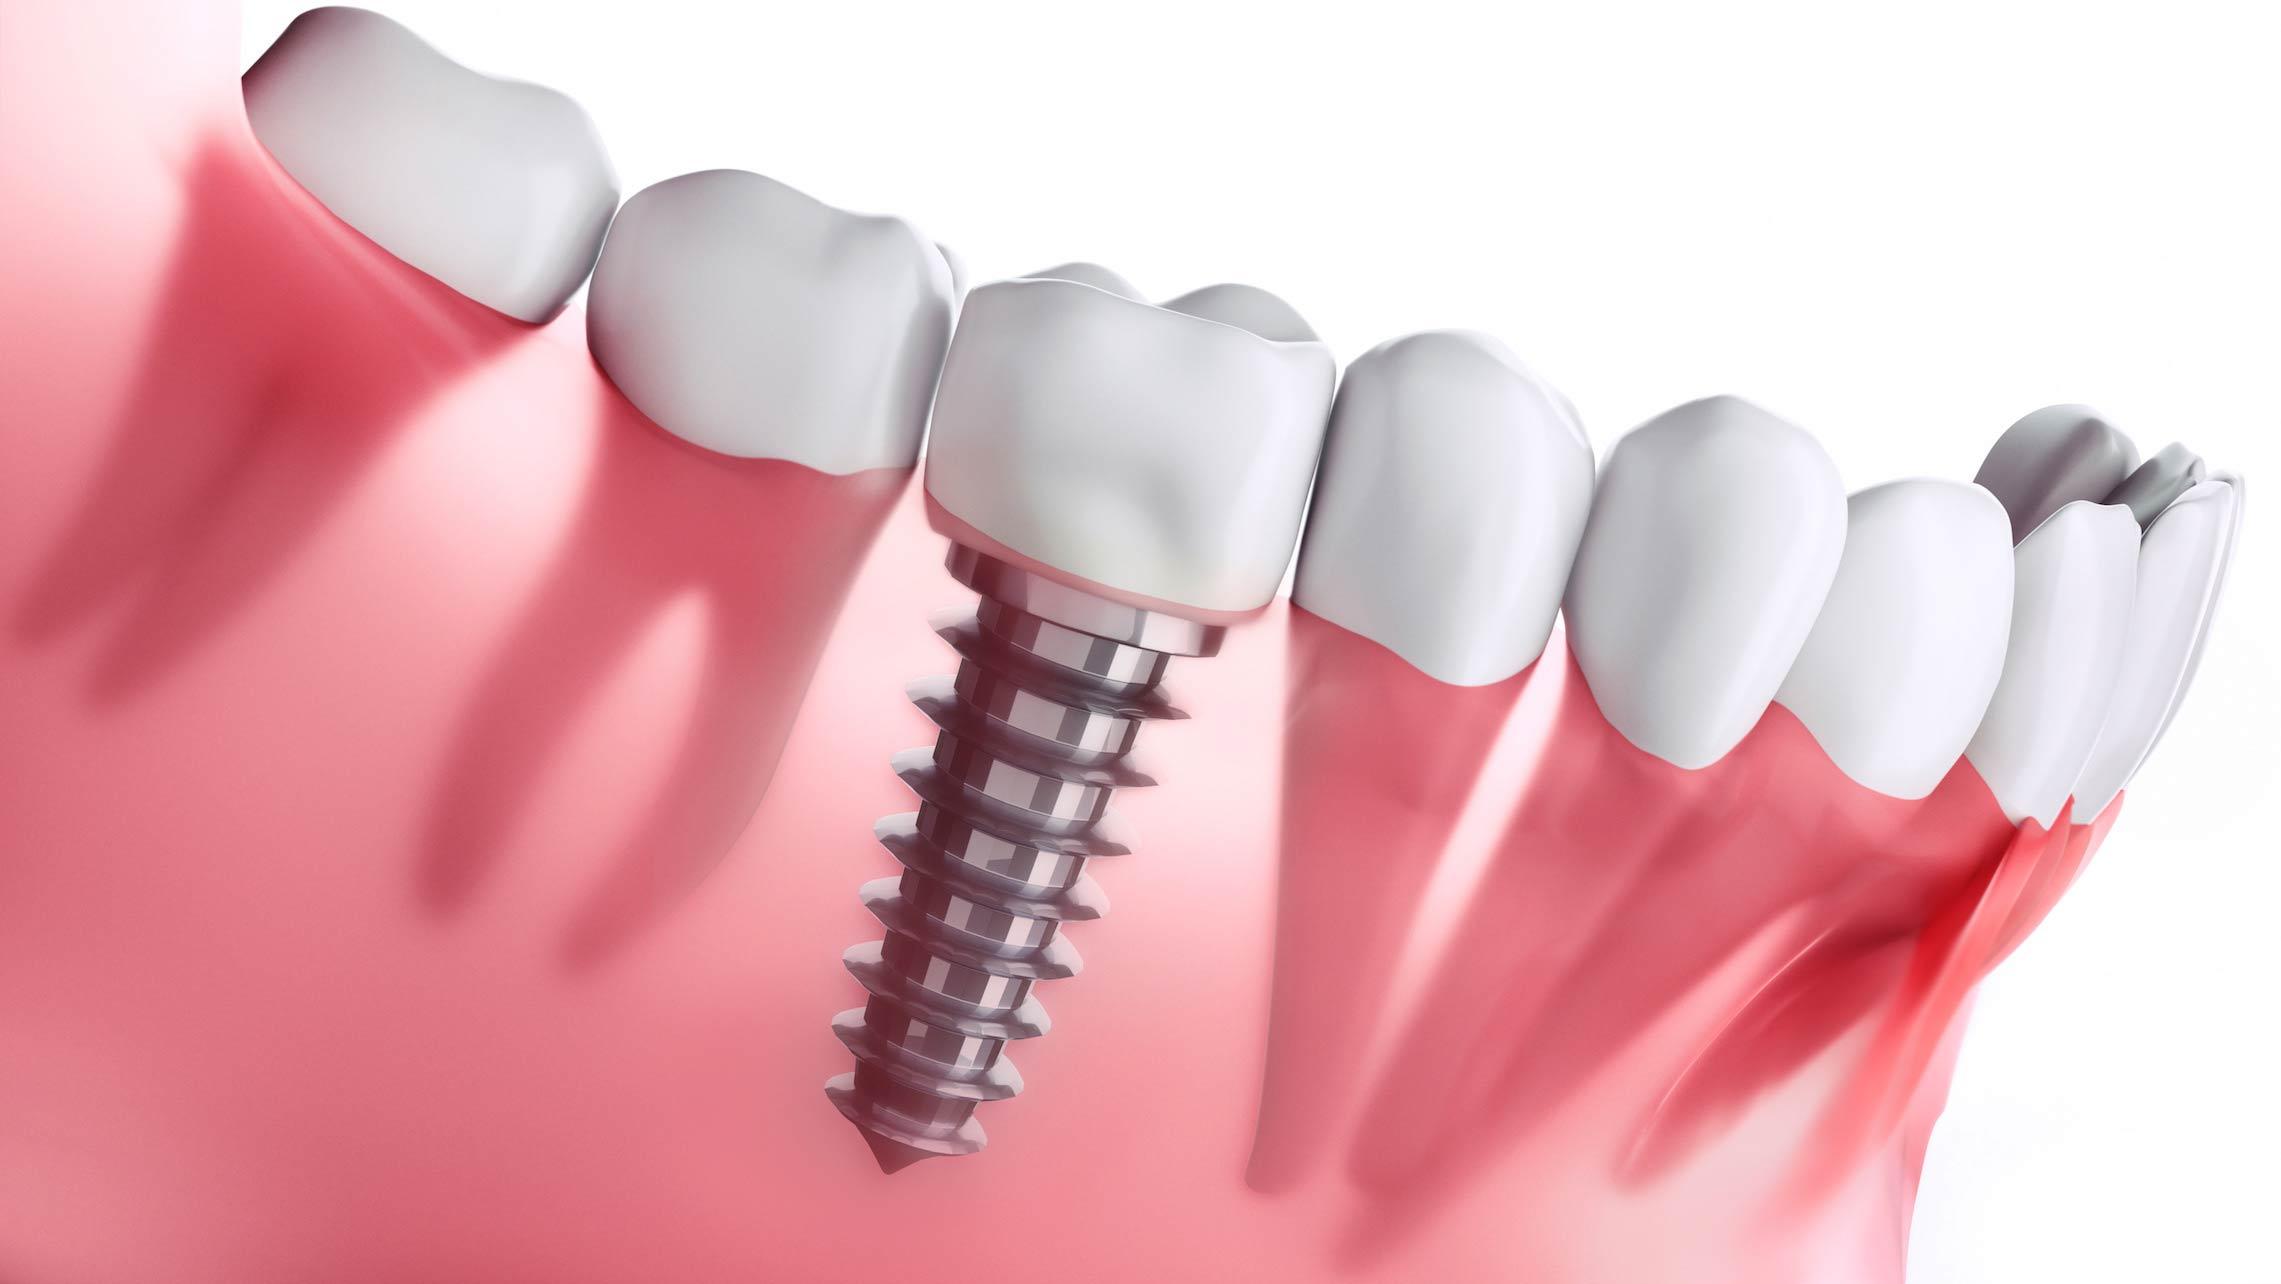 Dental Implants Procedure Explained - District Dentistry Charlotte